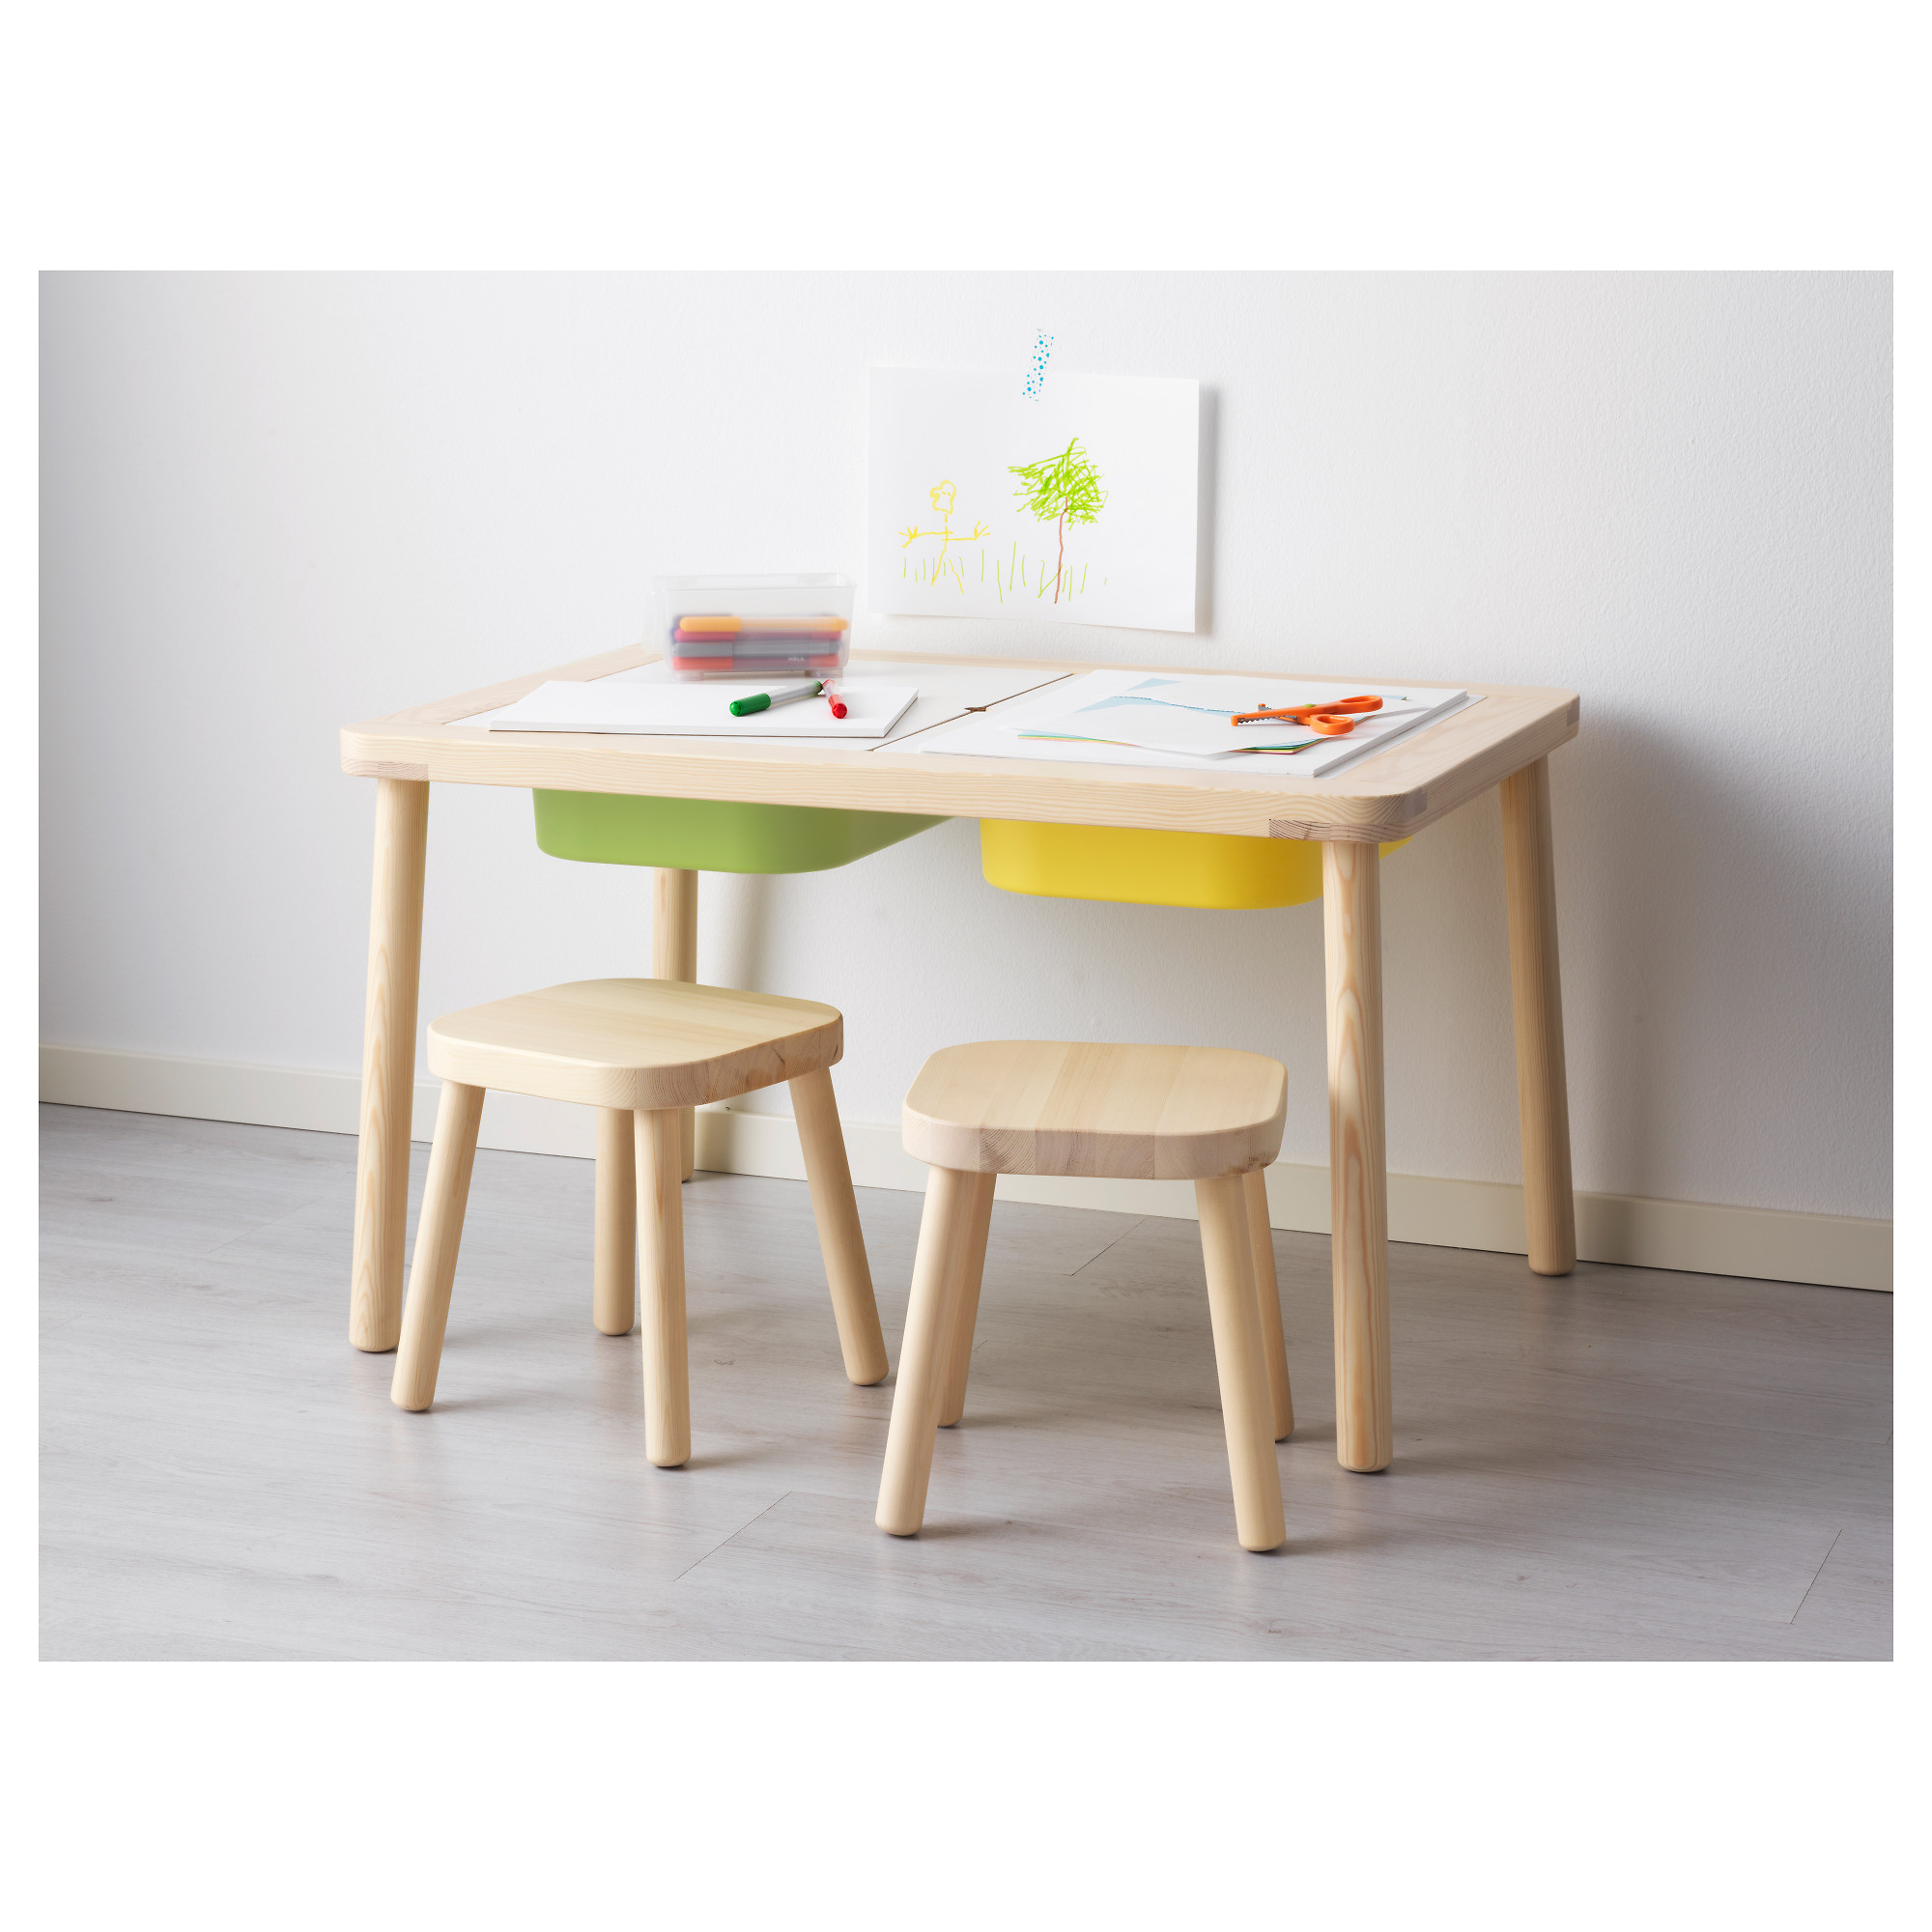 Fabulous Flisat Childrens Table Ikea Hong Kong Andrewgaddart Wooden Chair Designs For Living Room Andrewgaddartcom